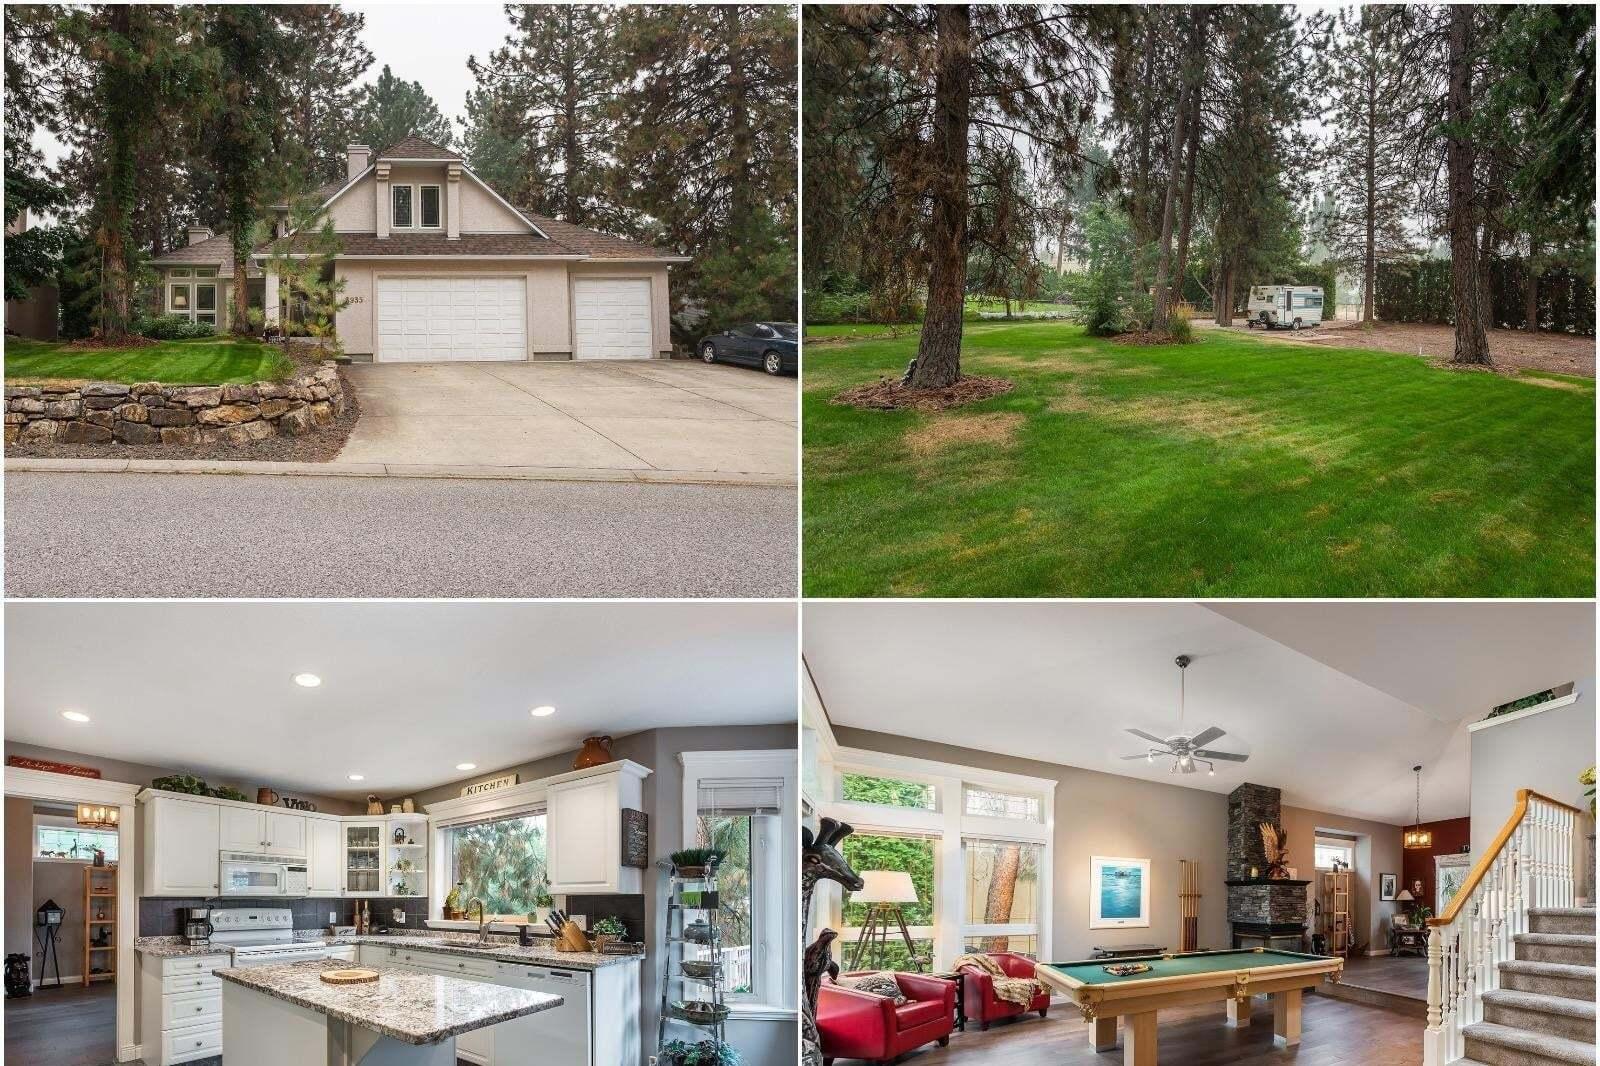 House for sale at 3935 Lakevale Pl Kelowna British Columbia - MLS: 10215177